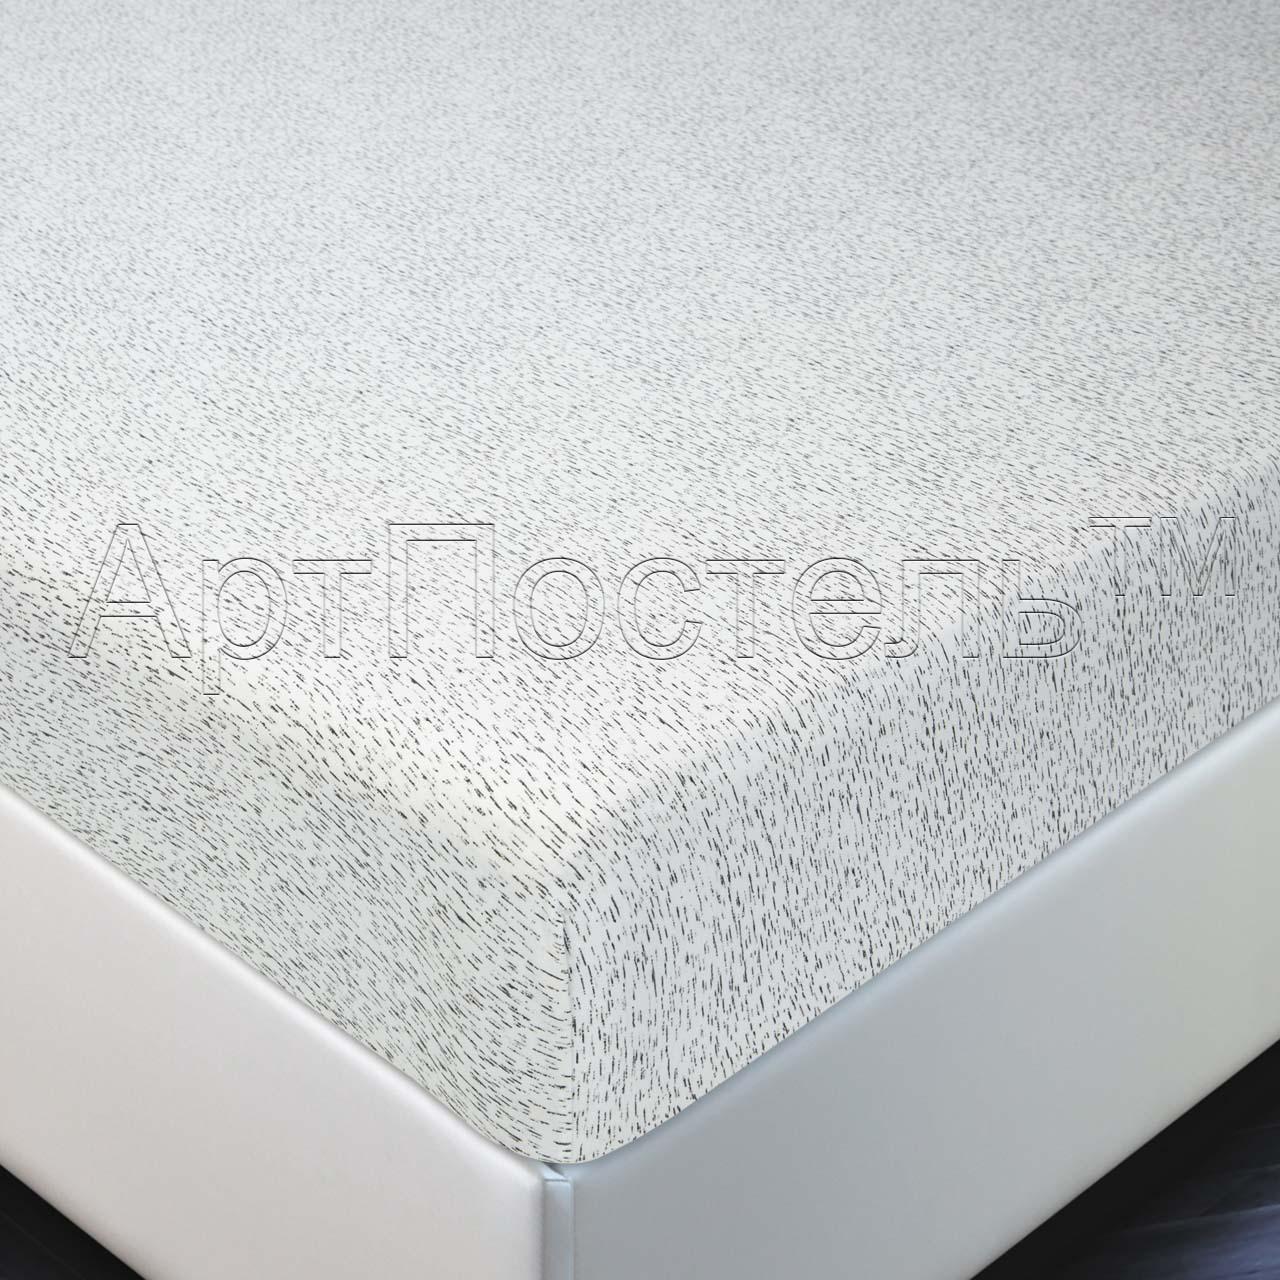 Простыня на резинке Березка р. 180х200Простыни<br>Плотность ткани: 140 г/кв. м<br><br>Тип: Простыня на резинке<br>Размер: 180х200<br>Материал: Кулирка